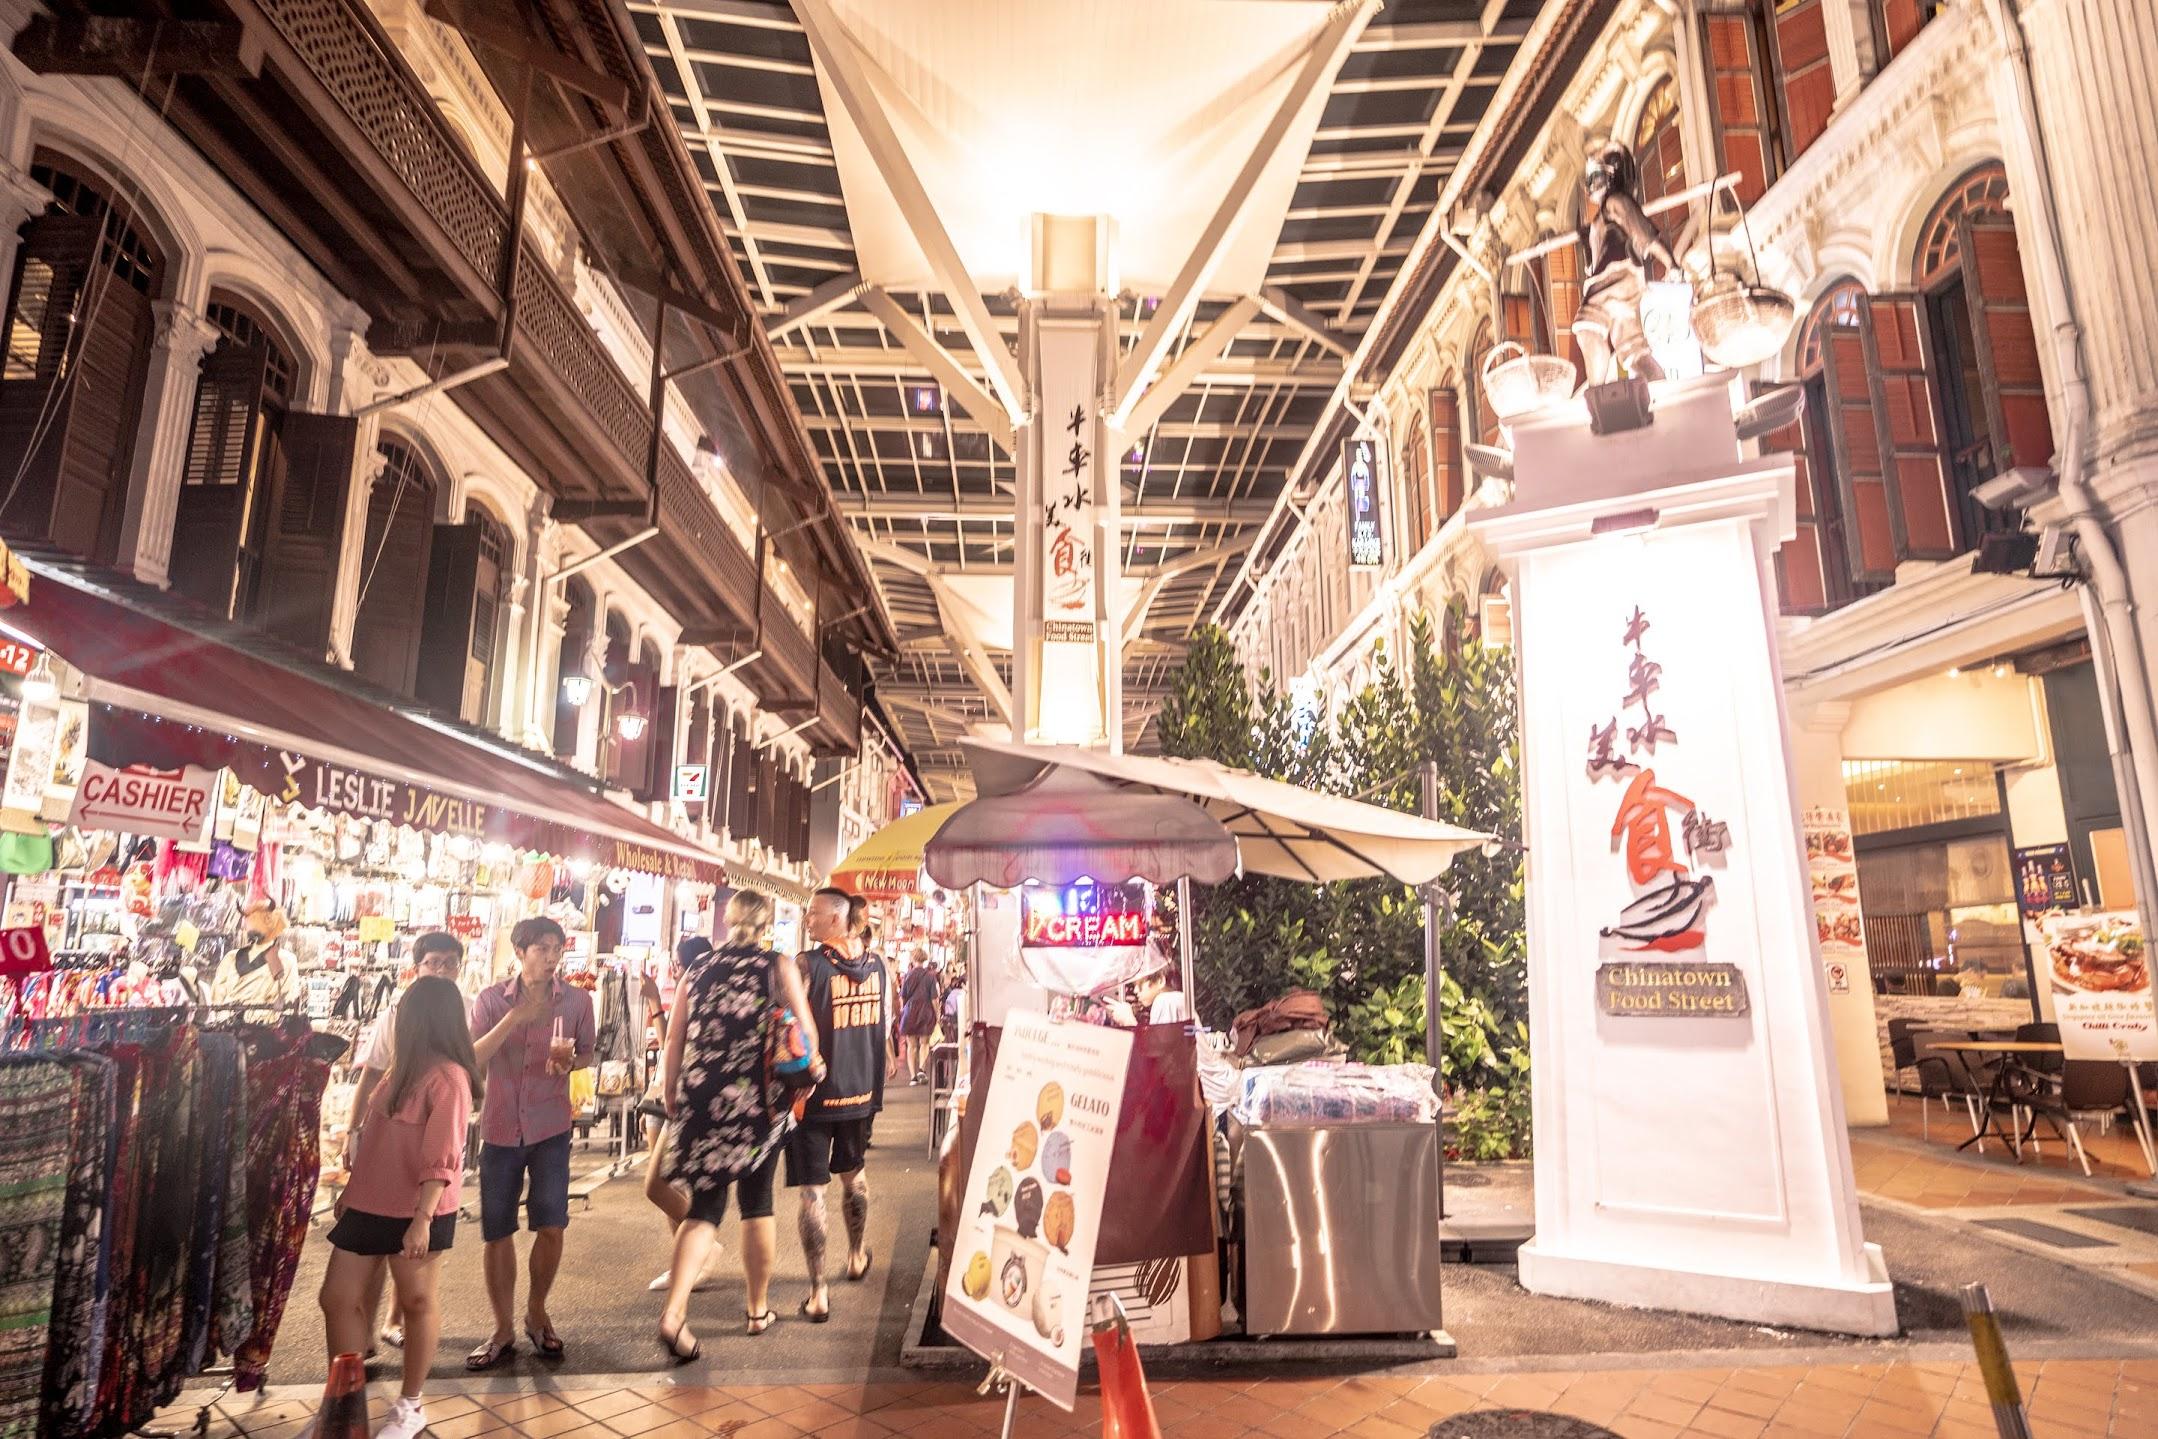 Singapore Chinatown Food Street1